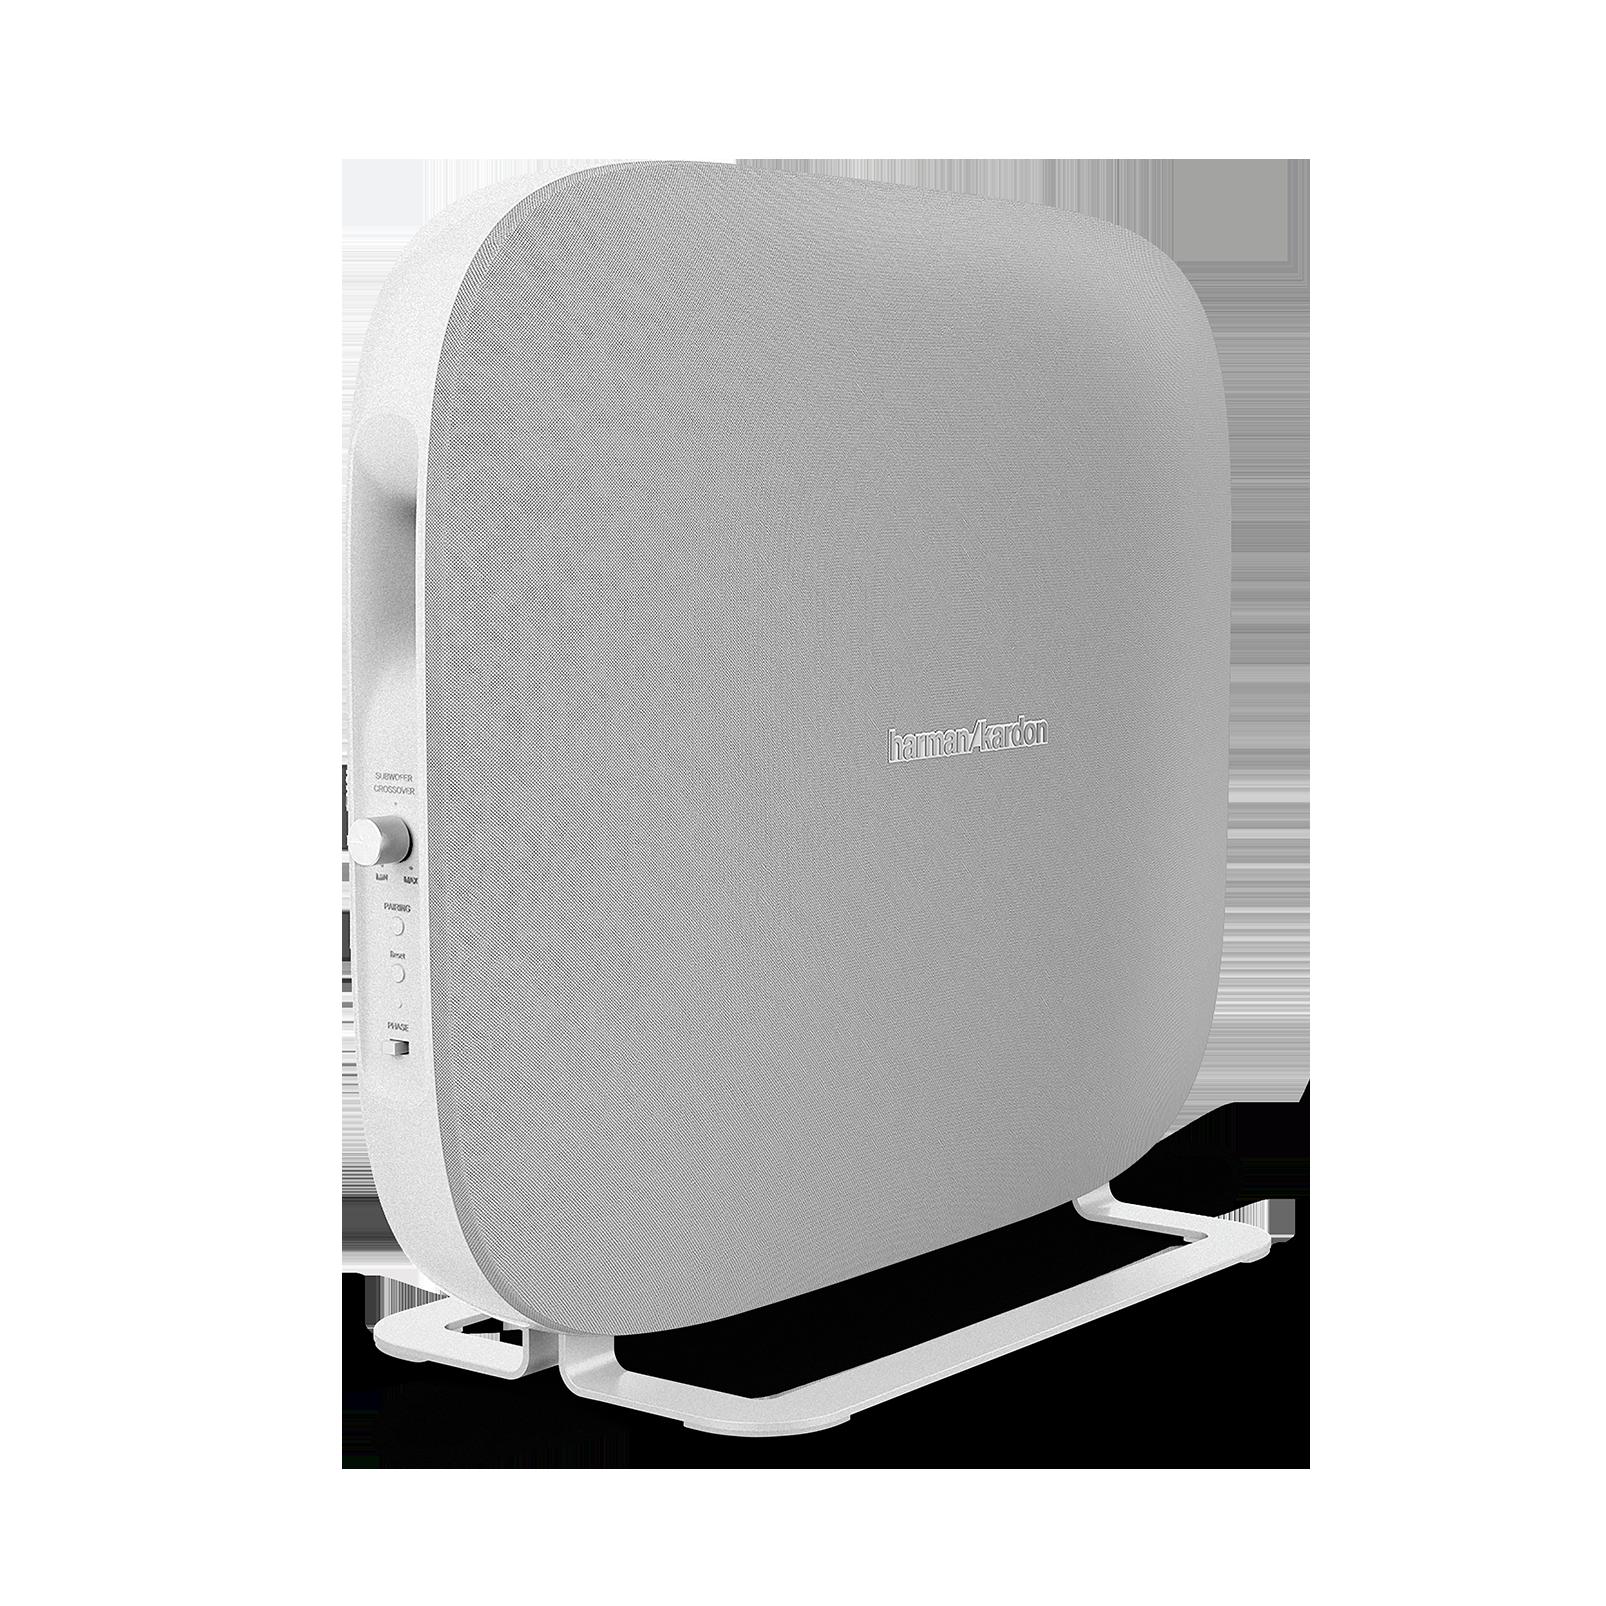 Omni Bar Plus - White - Wireless HD Soundbar - Front